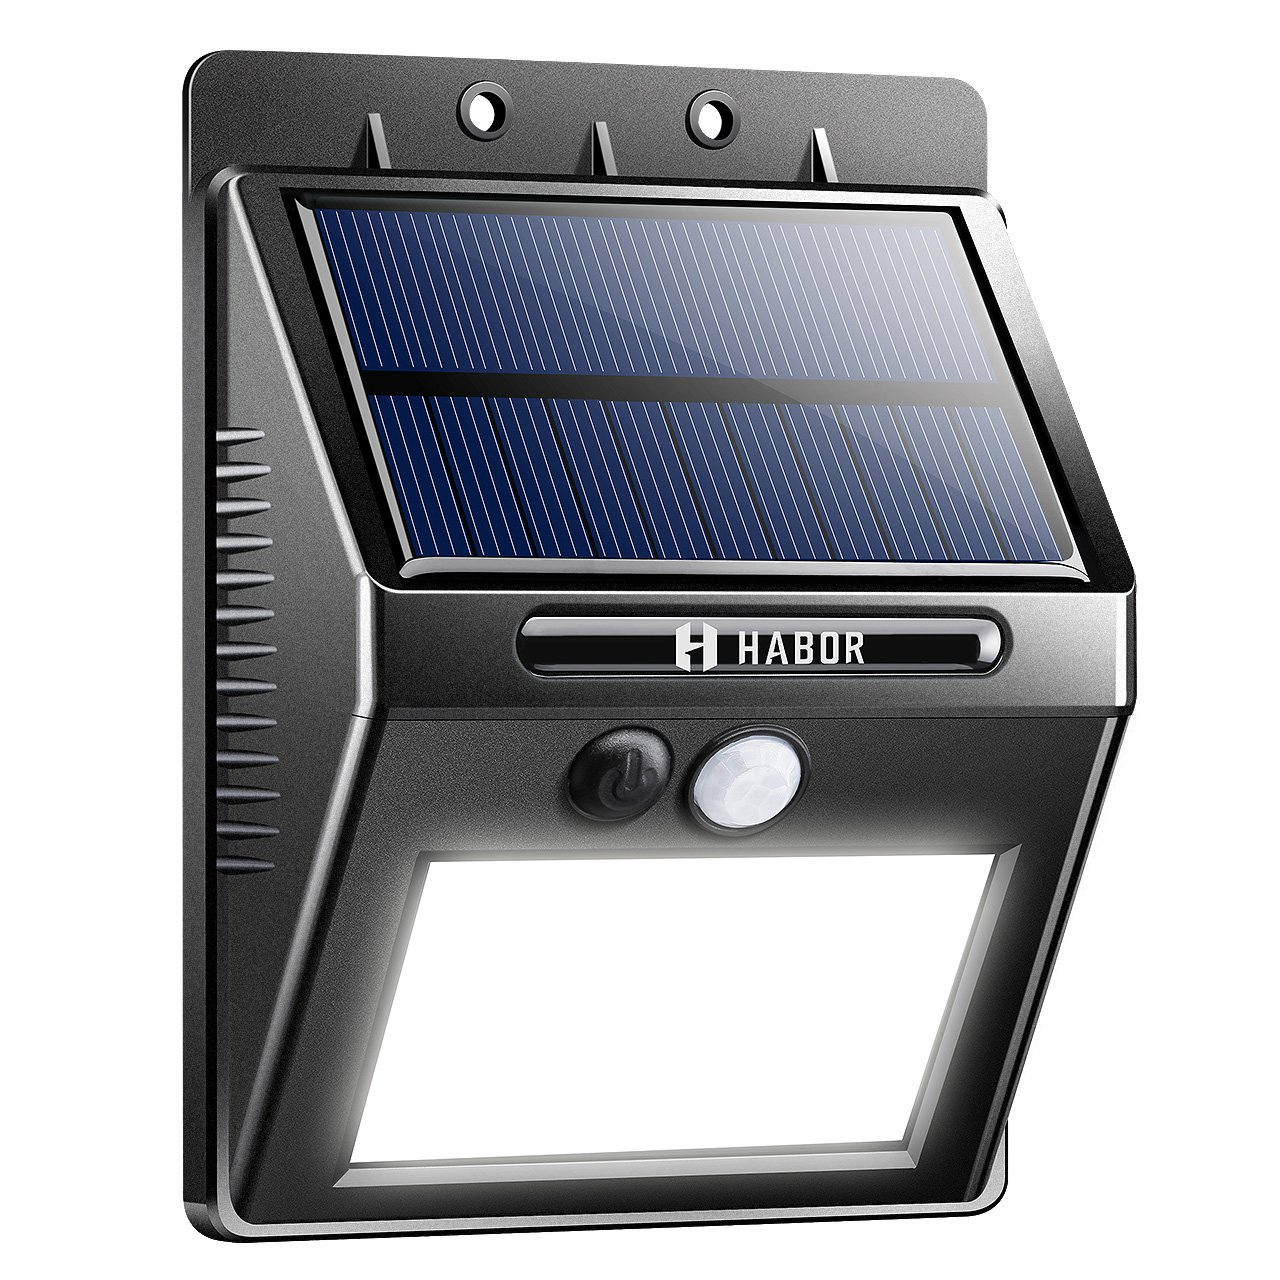 Habor Solar Lights Outdoor, Bright 20 LED Solar Motion Sensor Lights, Wireless Security Waterproof Wall Lights for Front Door Patio Garden Driveway Garage